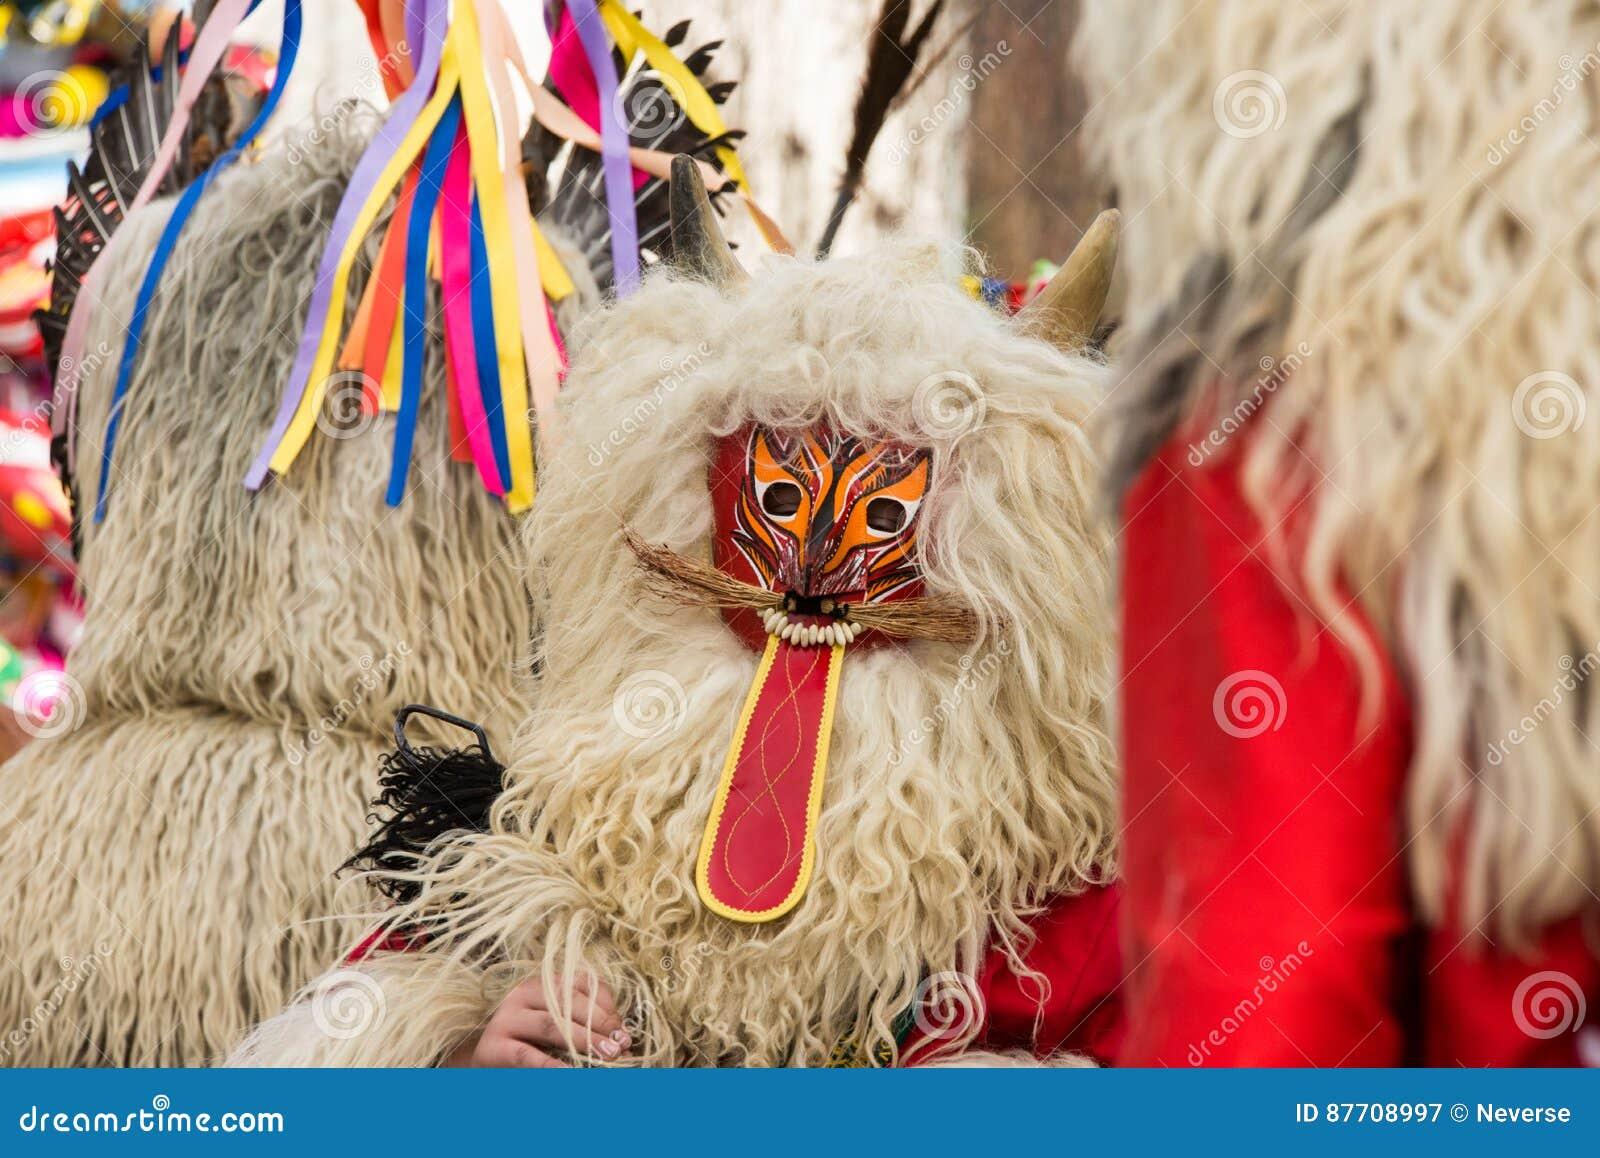 Costume traditionnel de carnaval annuel de Cerknica en Slovénie